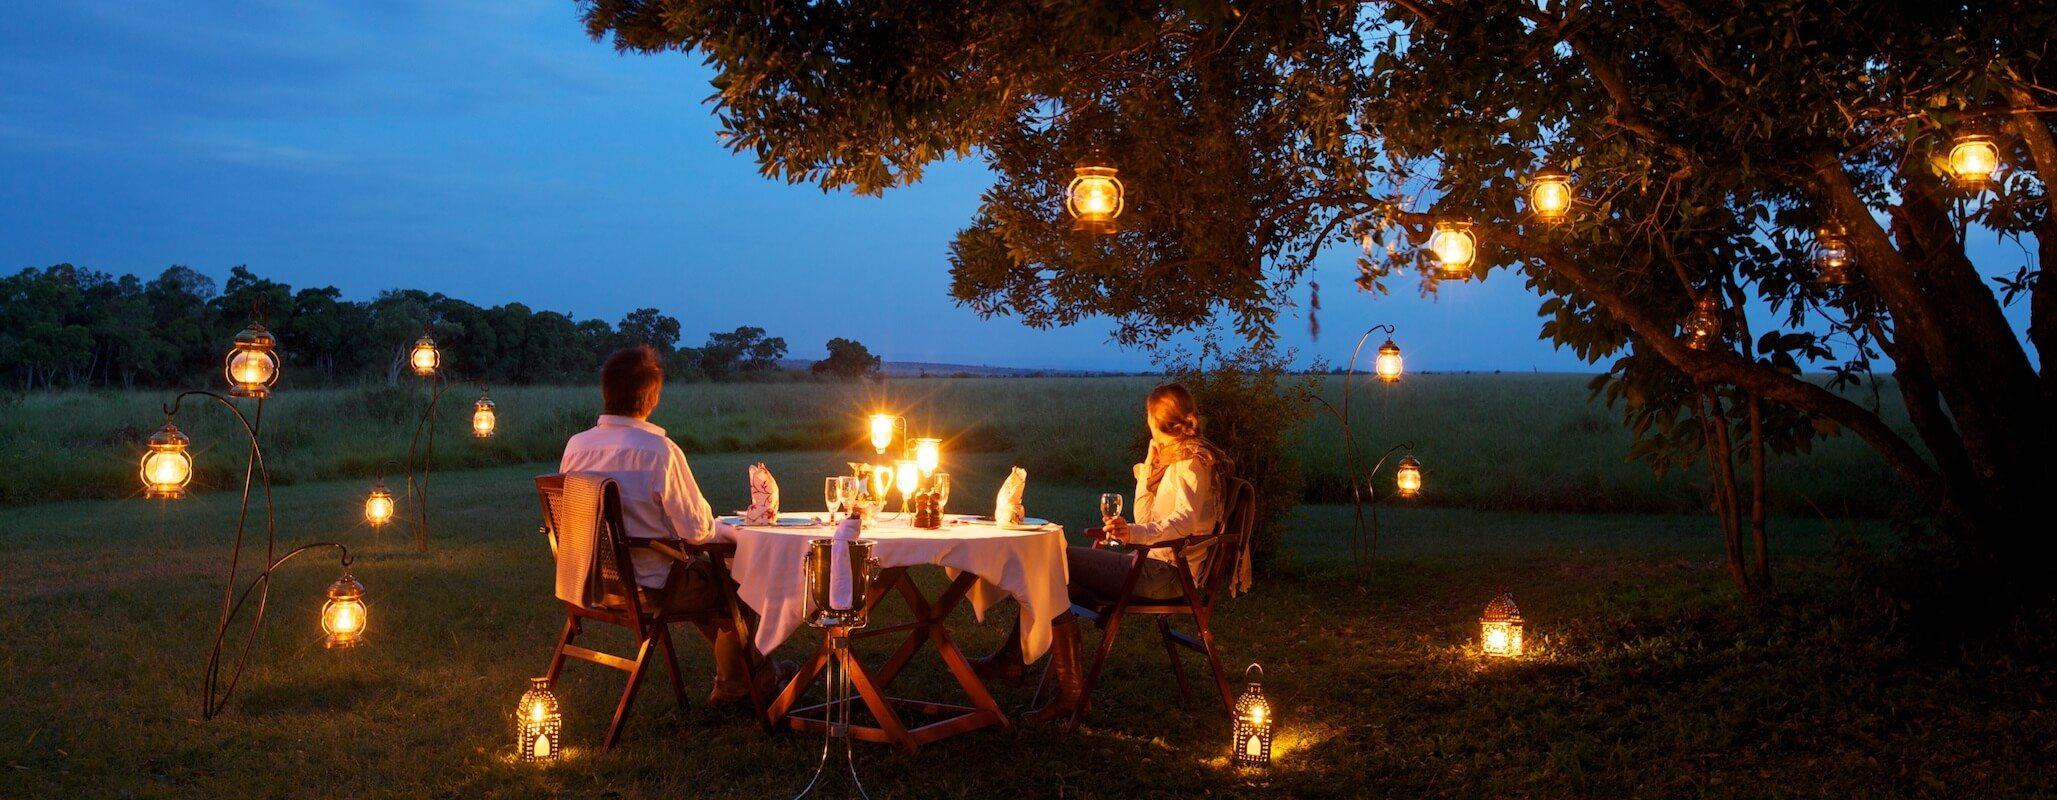 Kenya_MasaiMaraMaraNorth_Elewana Elephant Pepper Private Dining Celebration